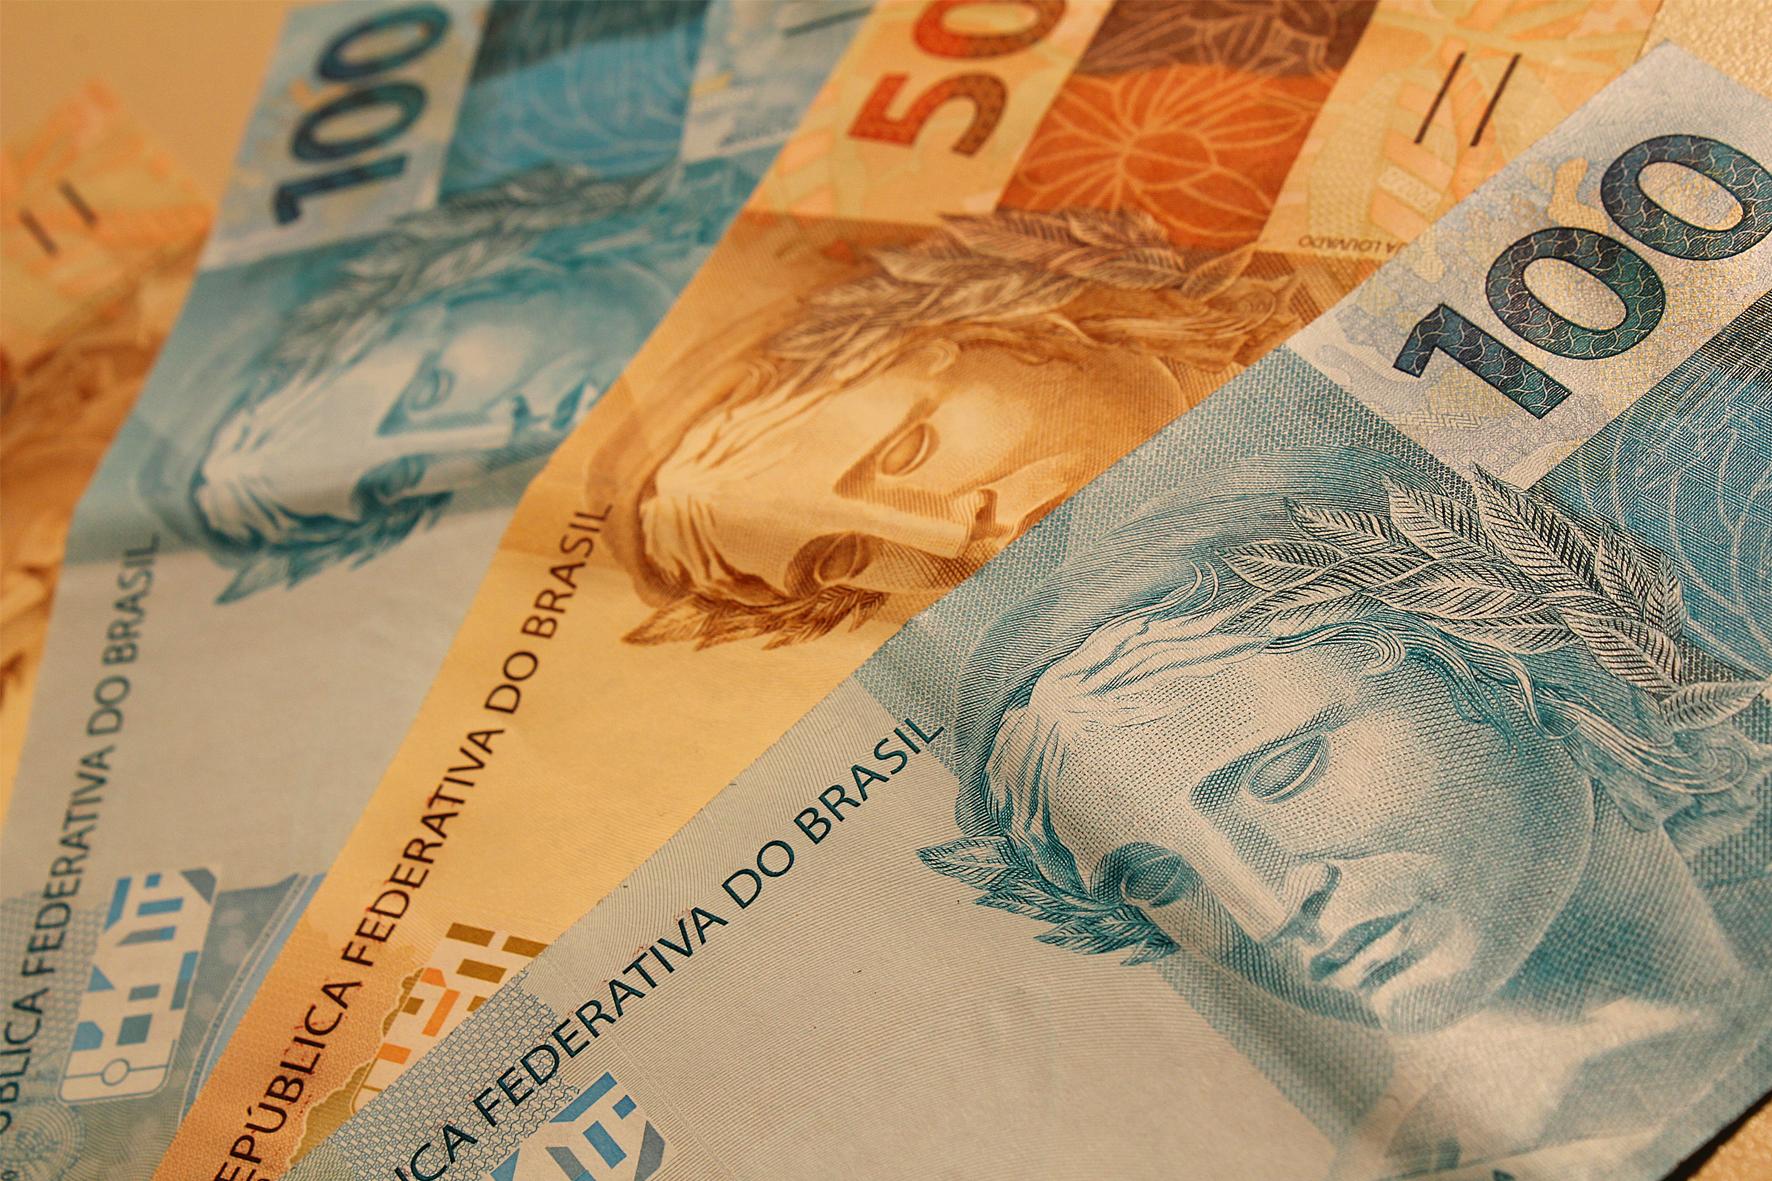 Economia Brasileira - novas notas do Real